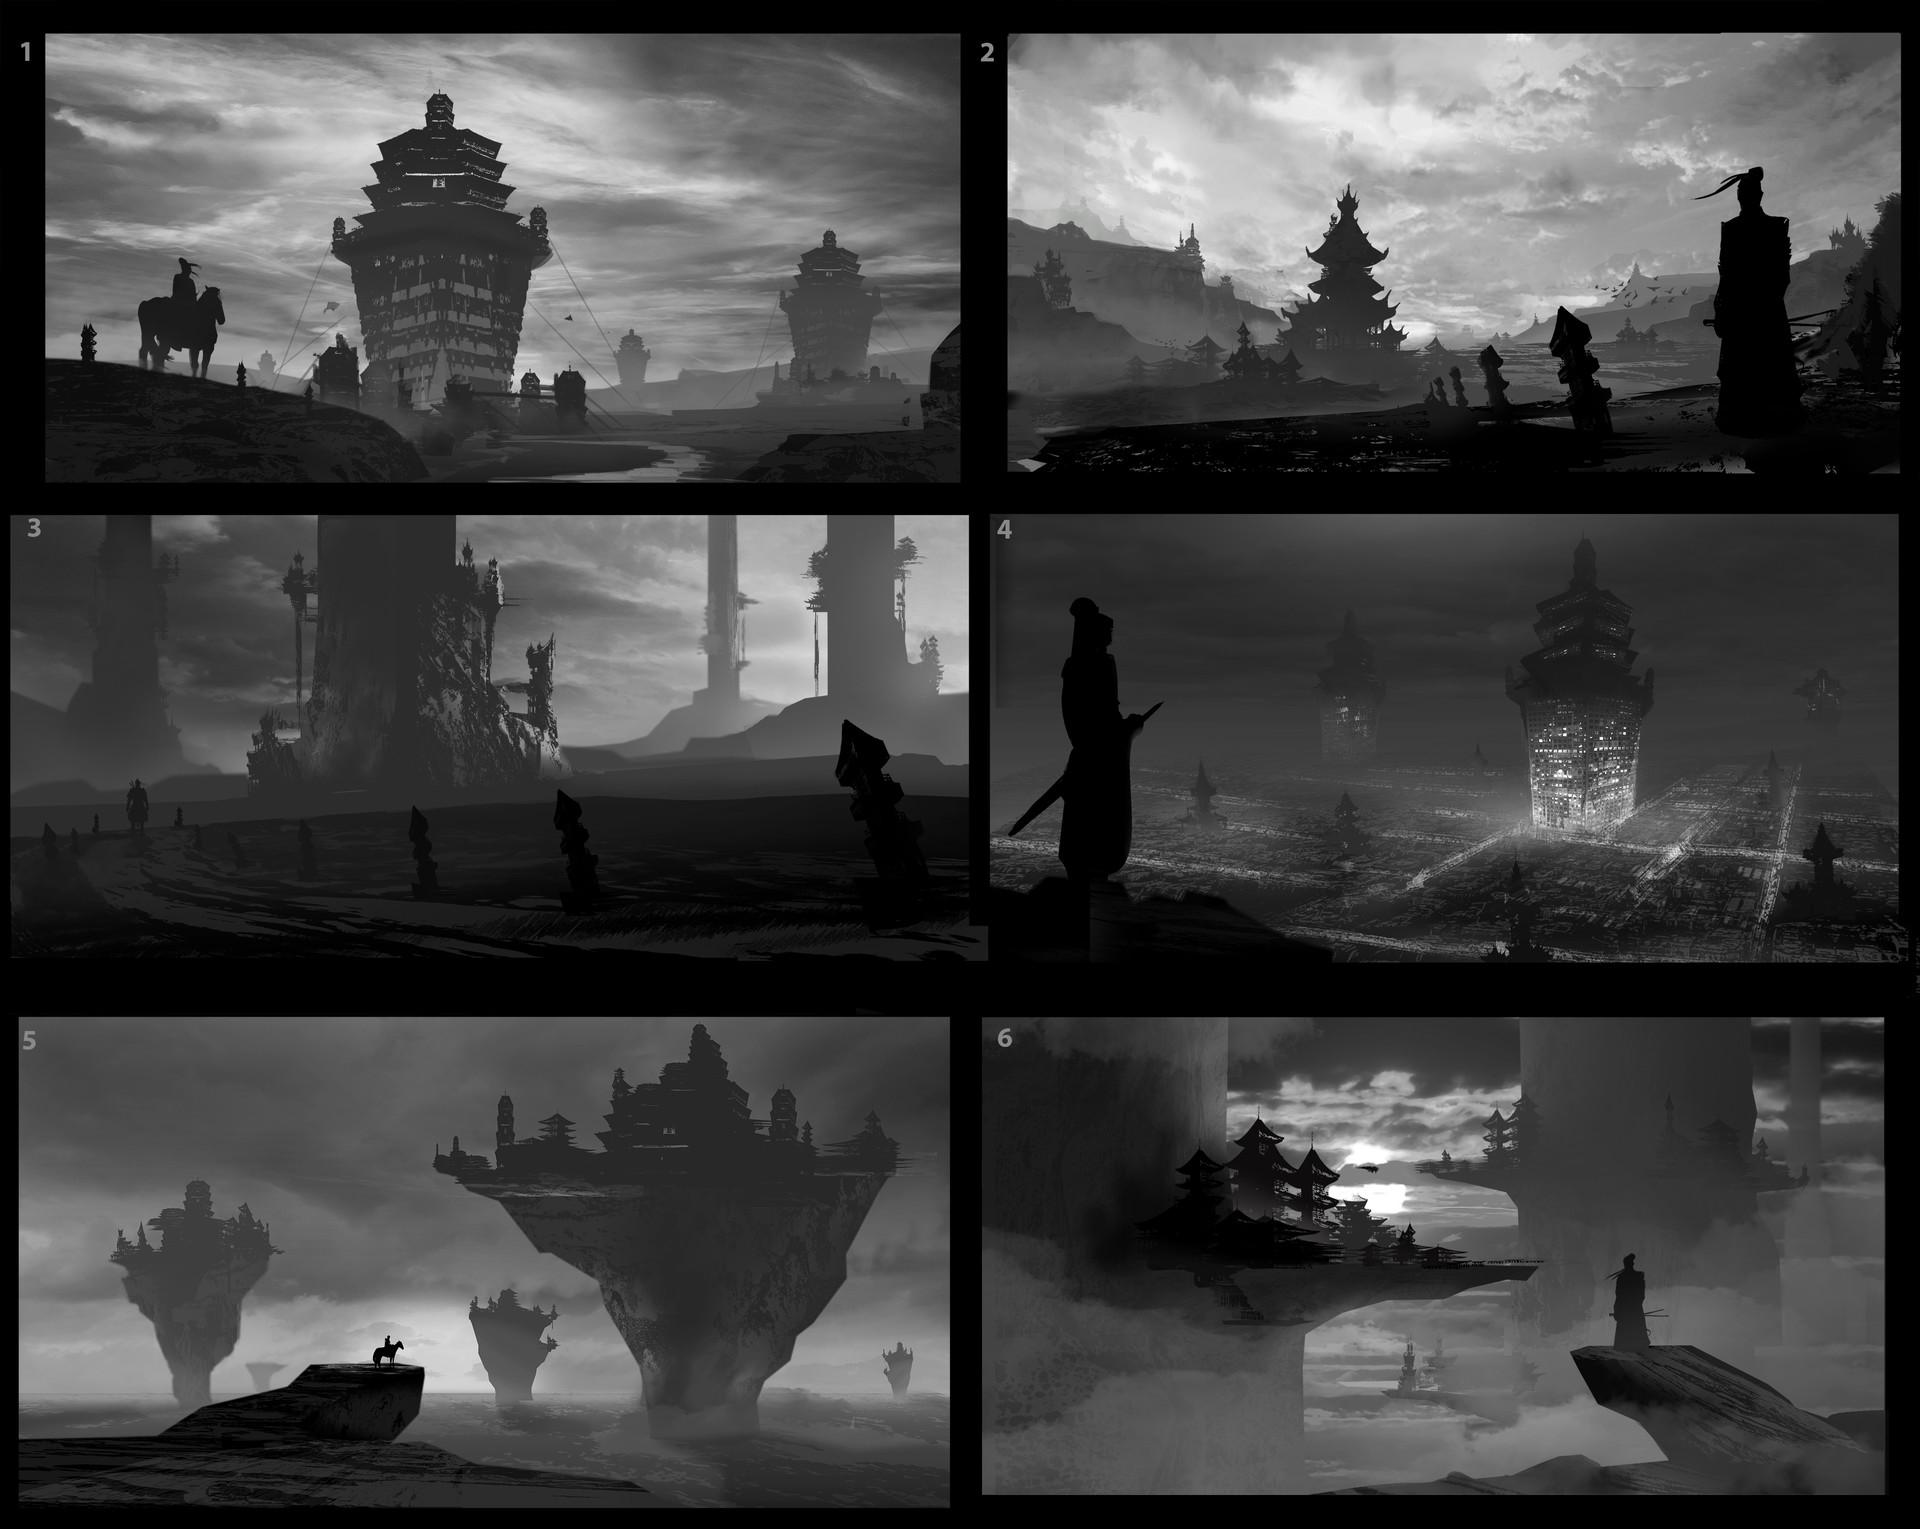 Dennis van kessel environment 6 thumbnails